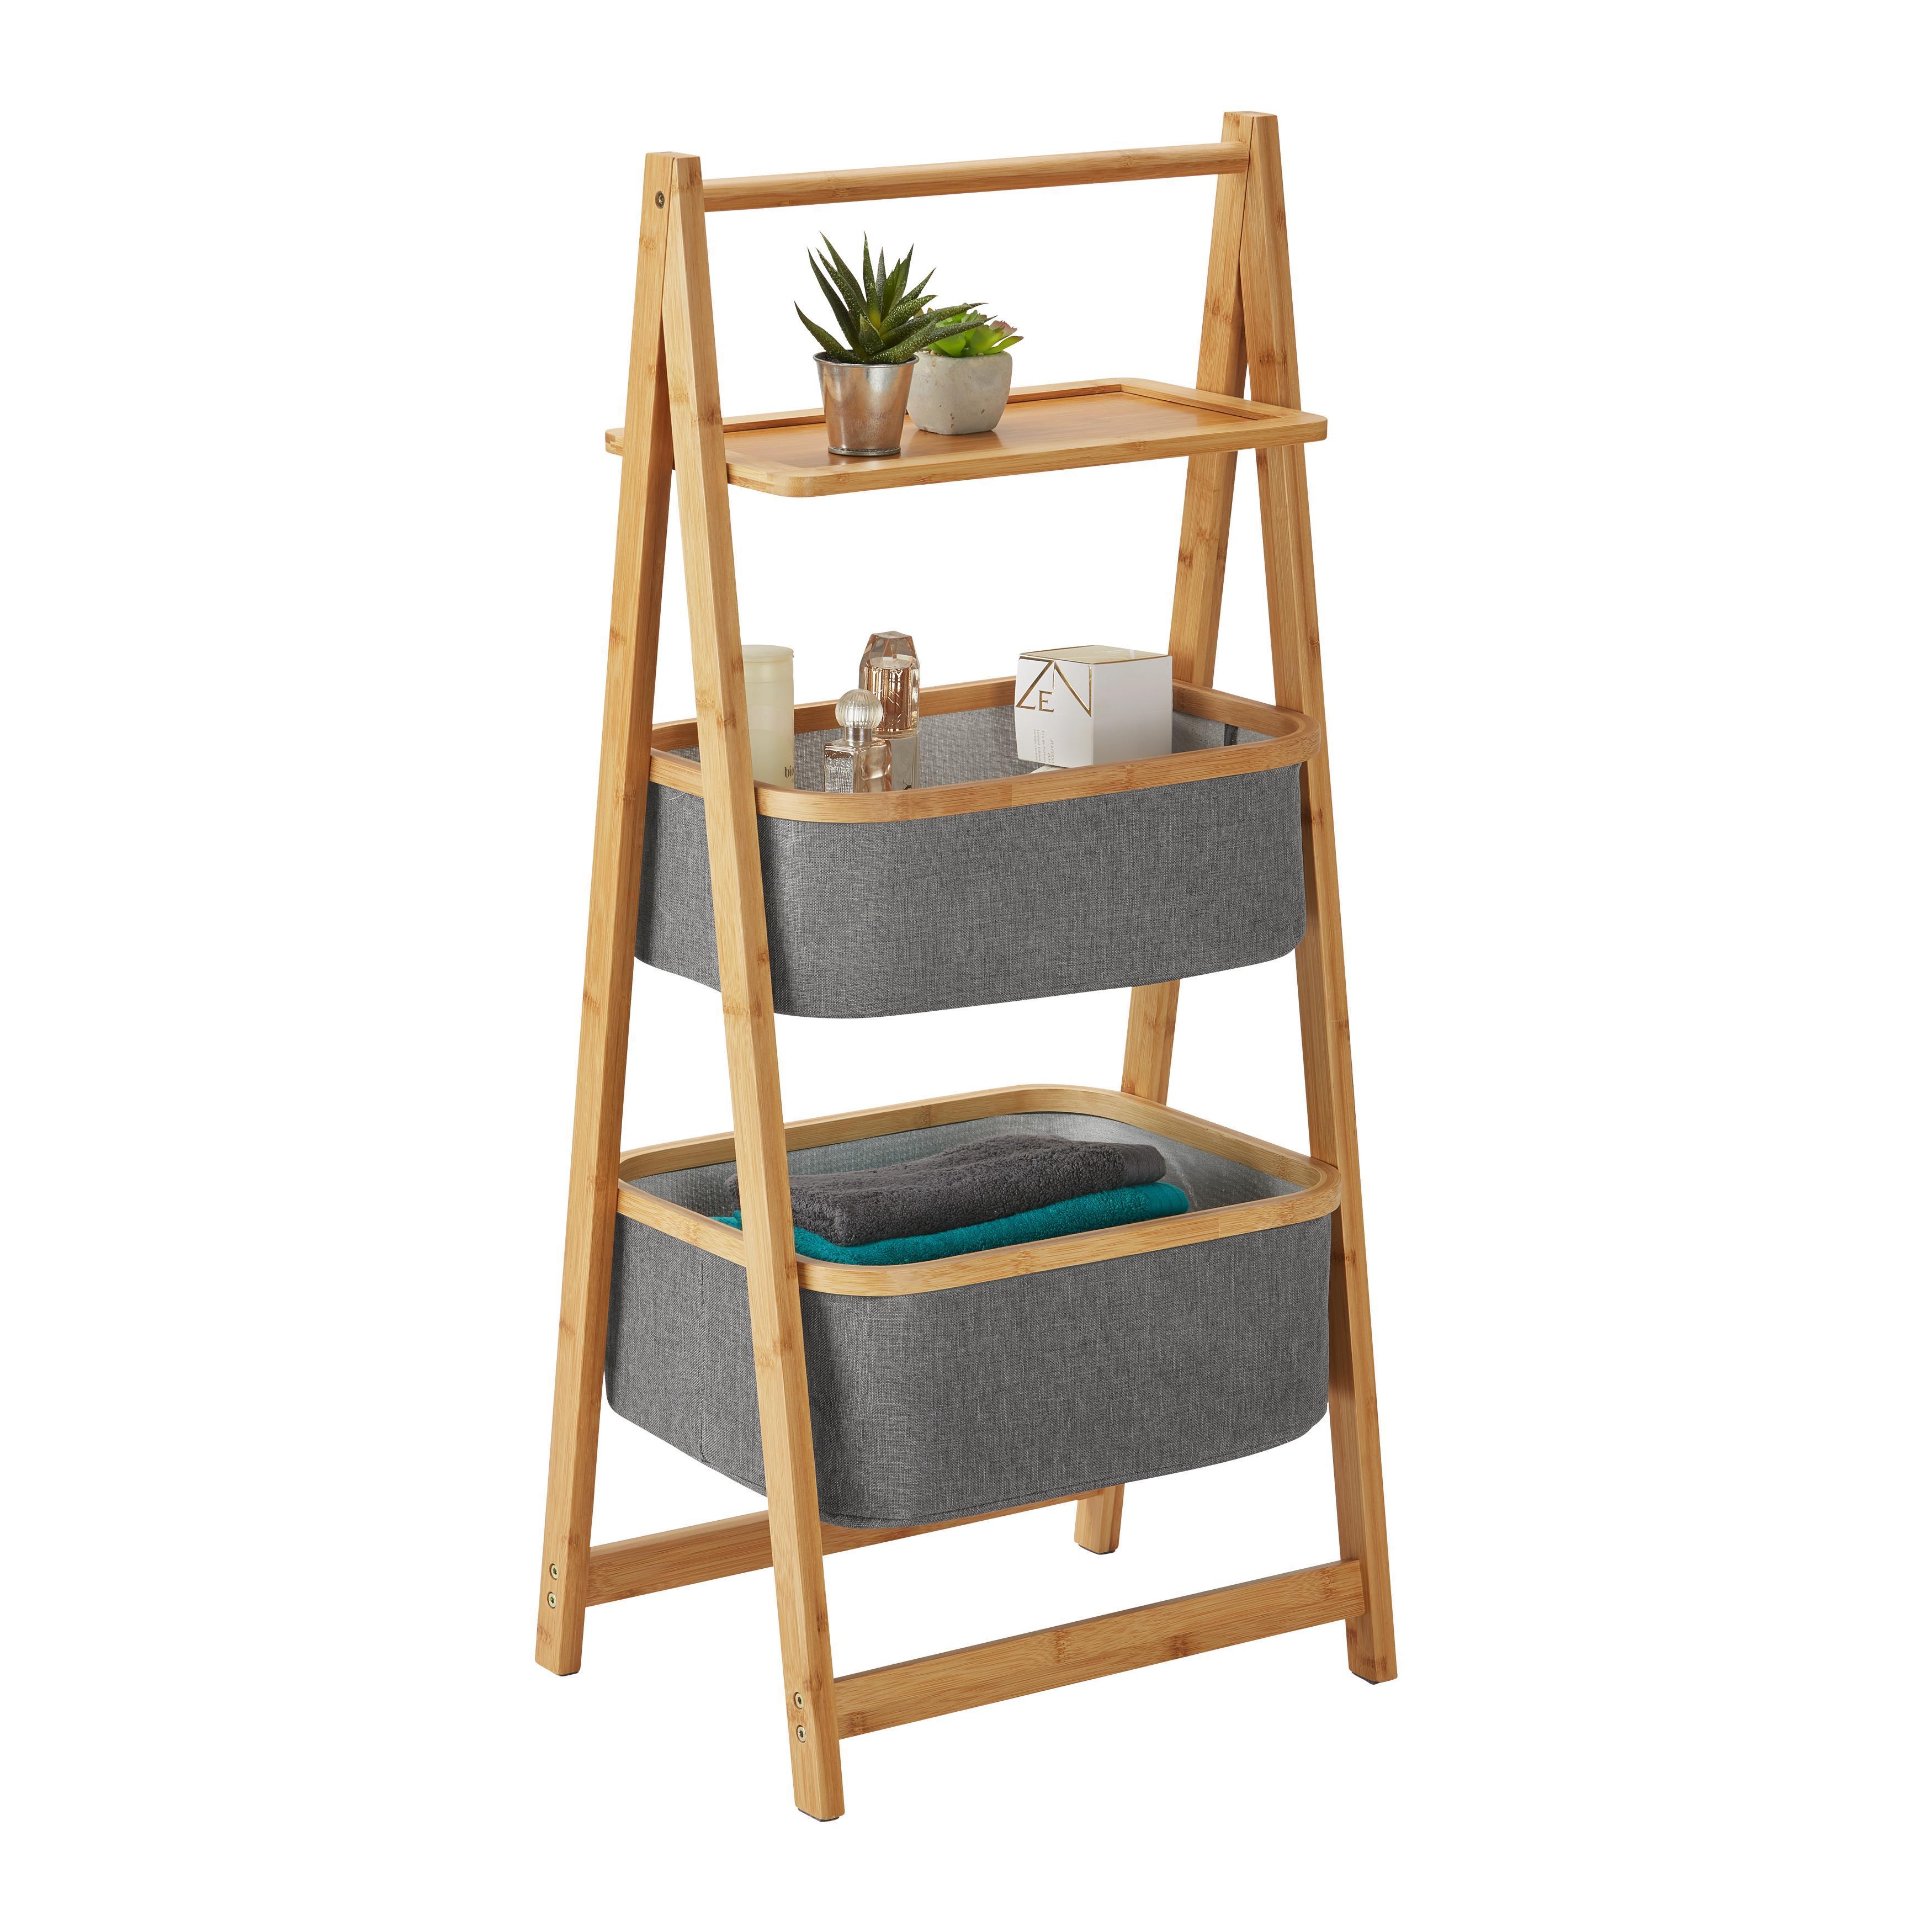 Schrages Regal Ikea – Caseconrad.com